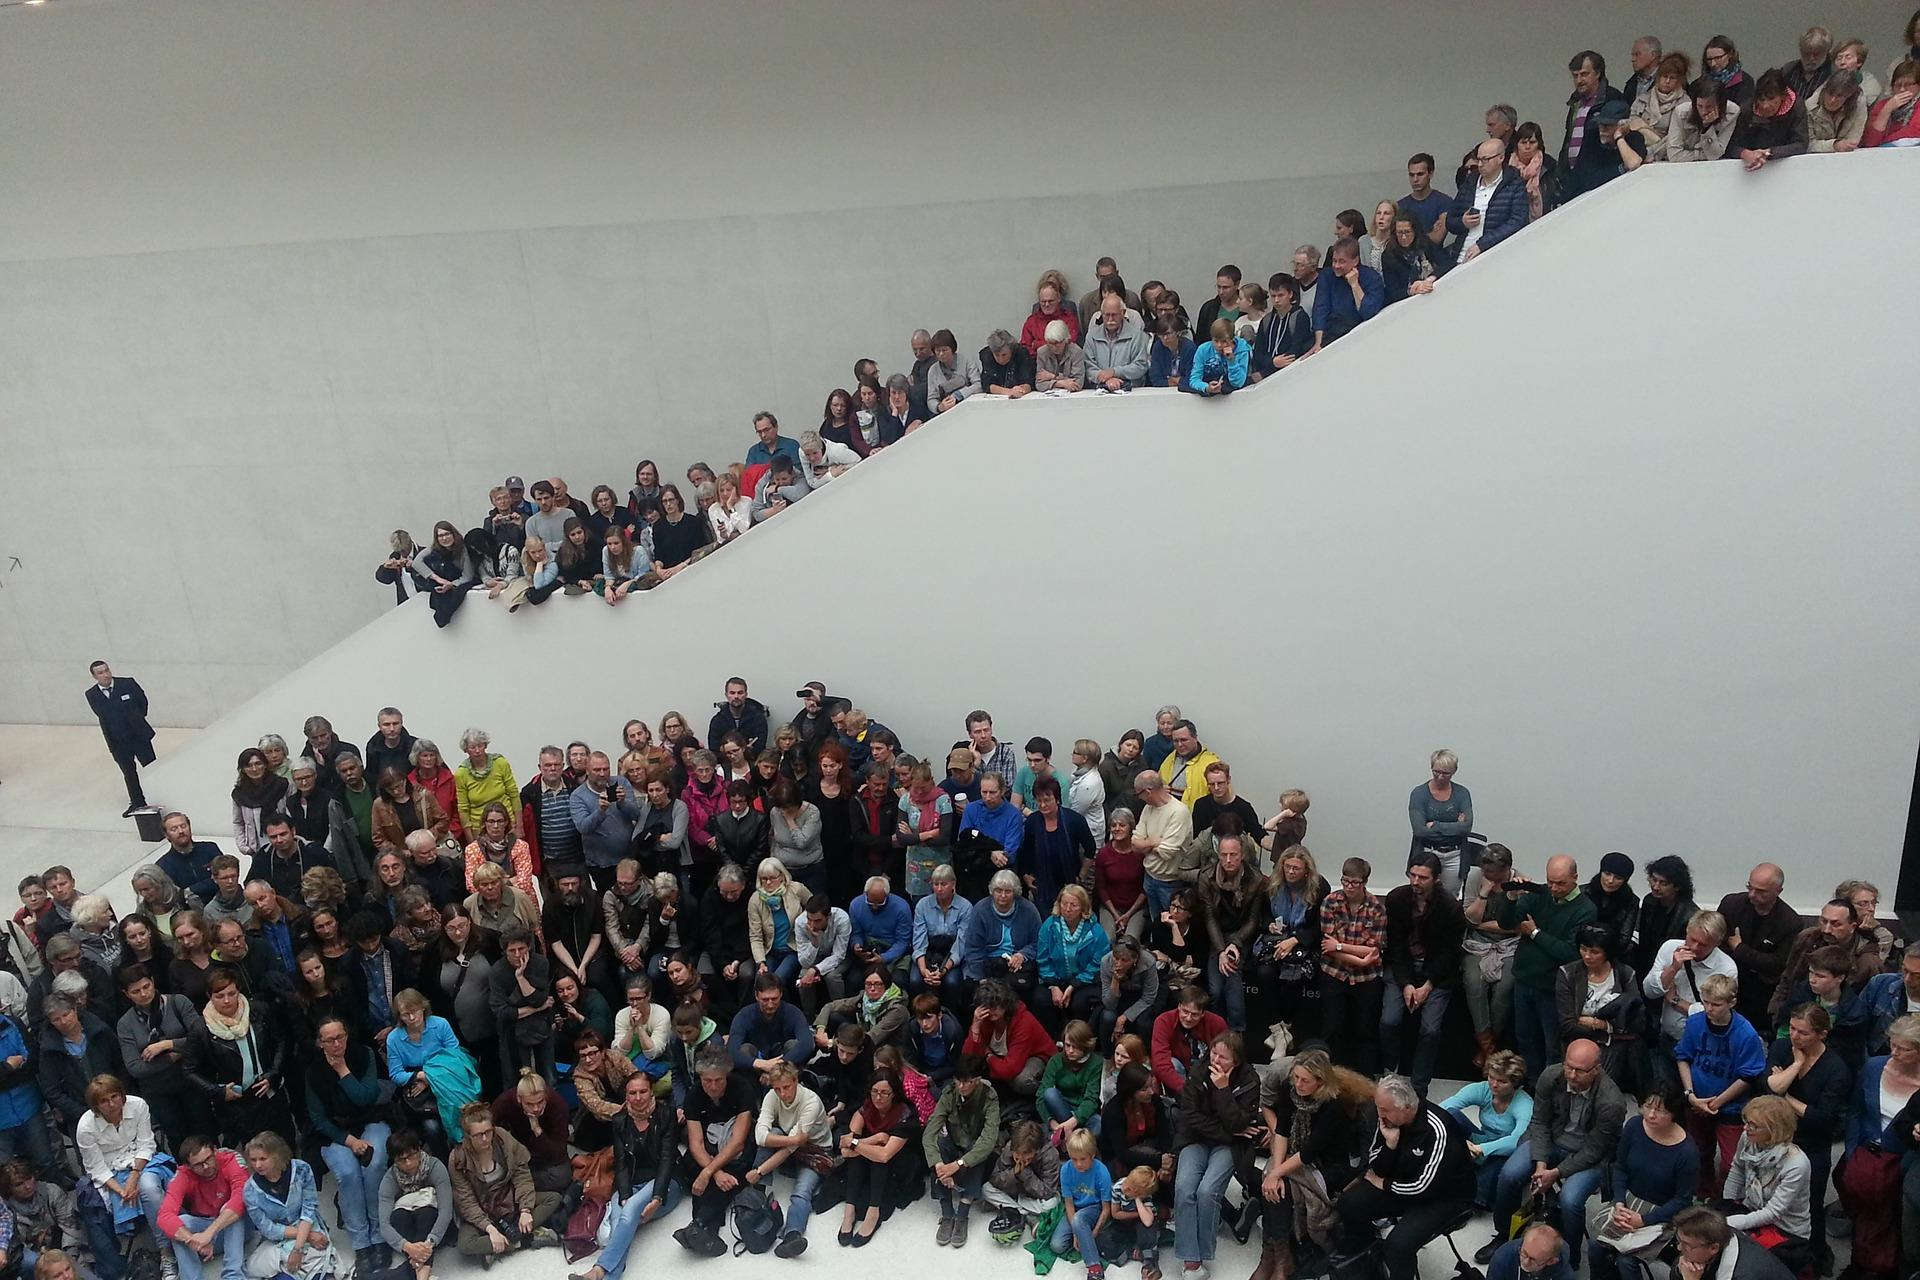 Menschenmenge (c) www.pixabay.com